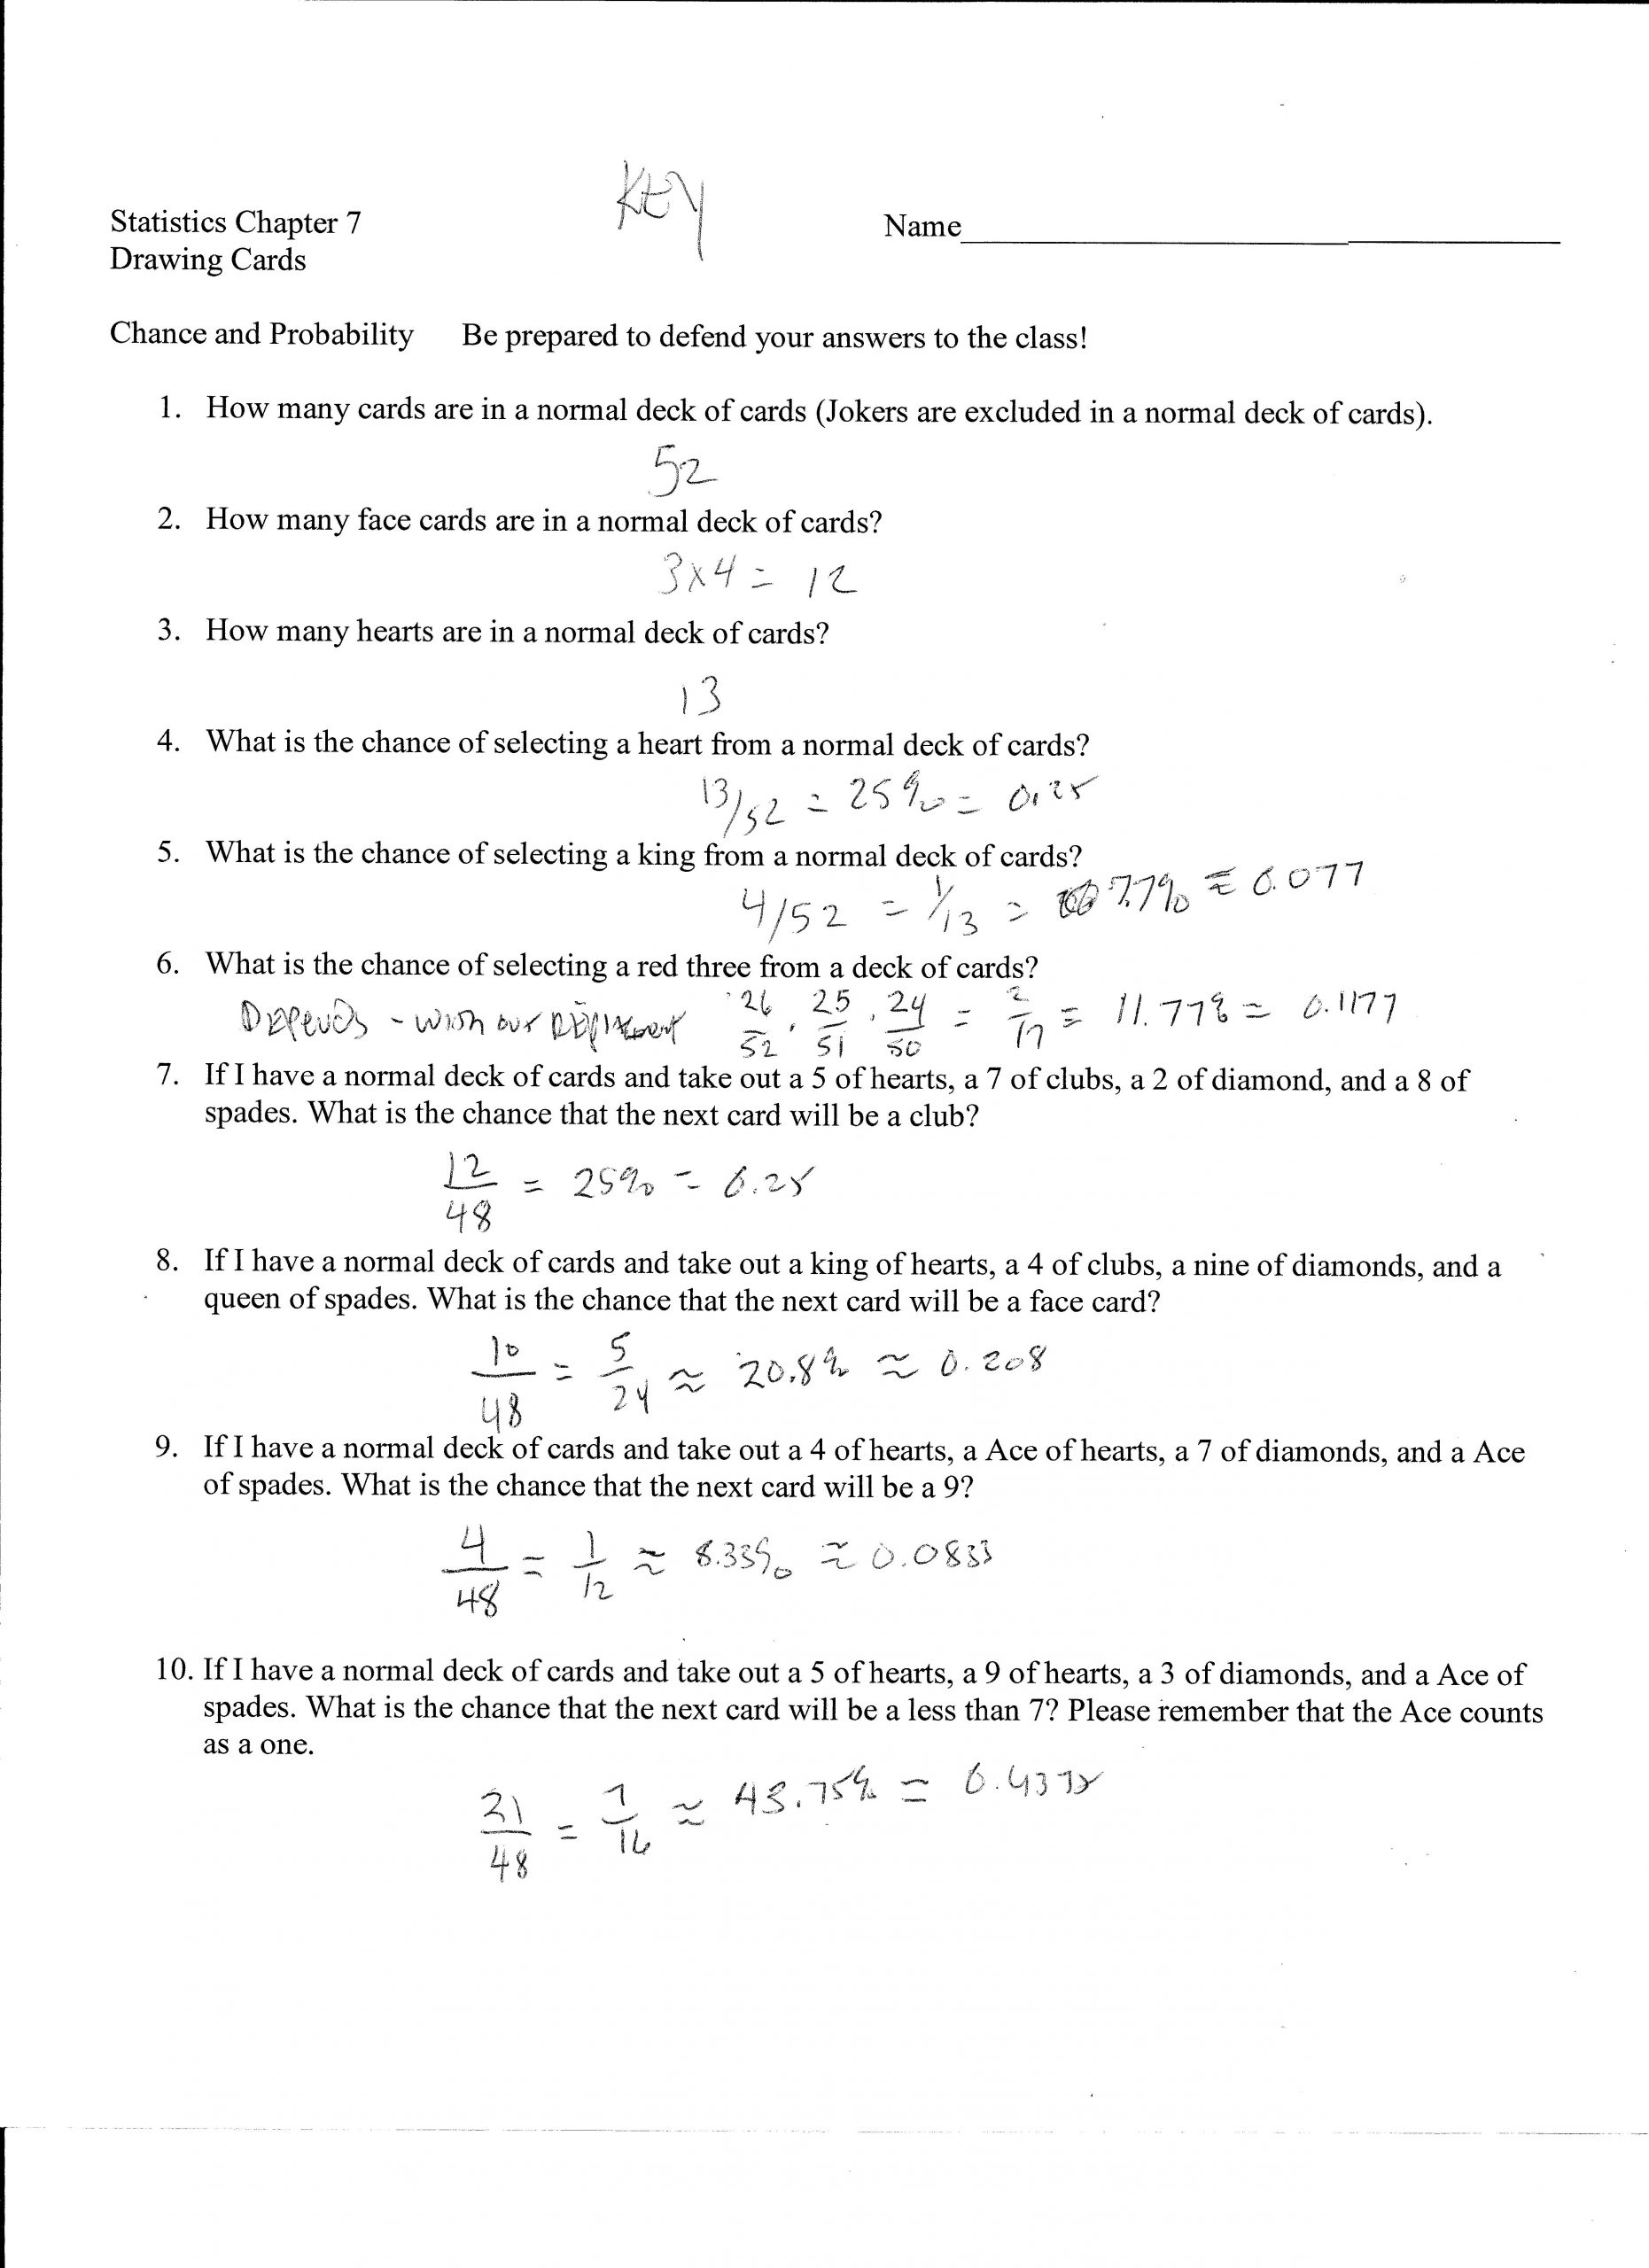 Z Score Practice Worksheet Z Score Practice Worksheet – Merit Badge Worksheets